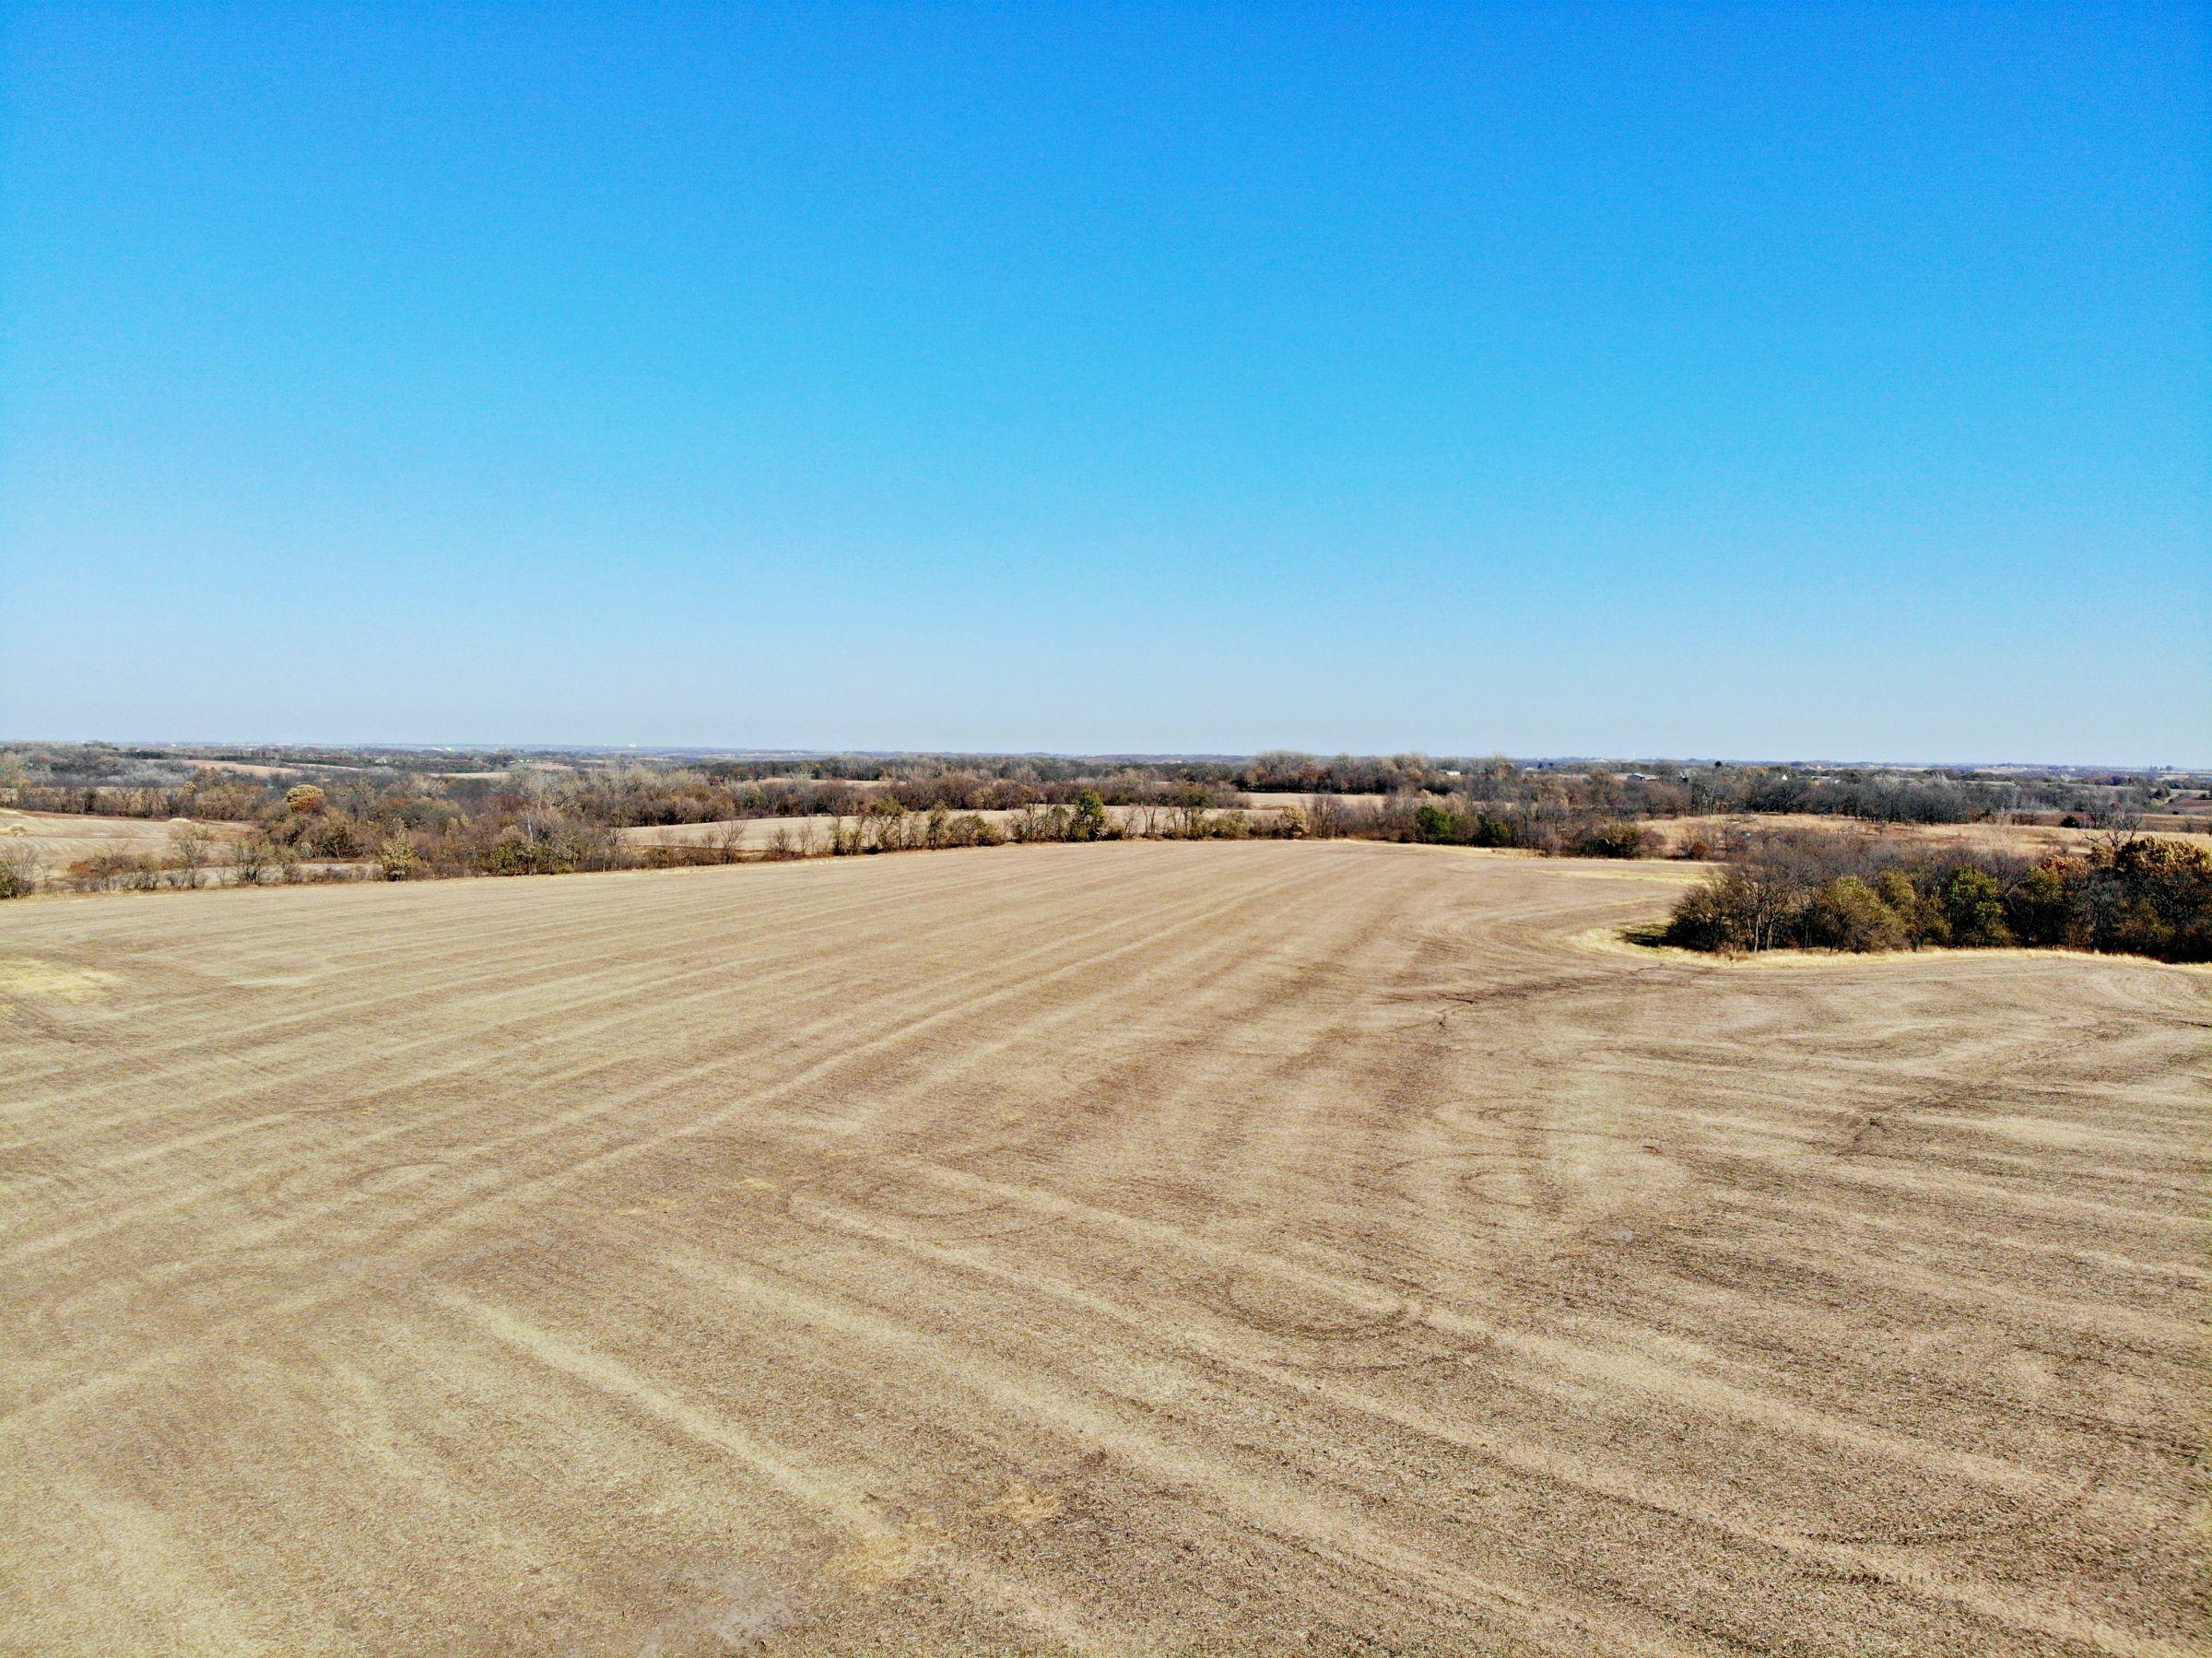 land-warren-county-iowa-68-acres-listing-number-15255-4-2020-11-10-212942.JPG